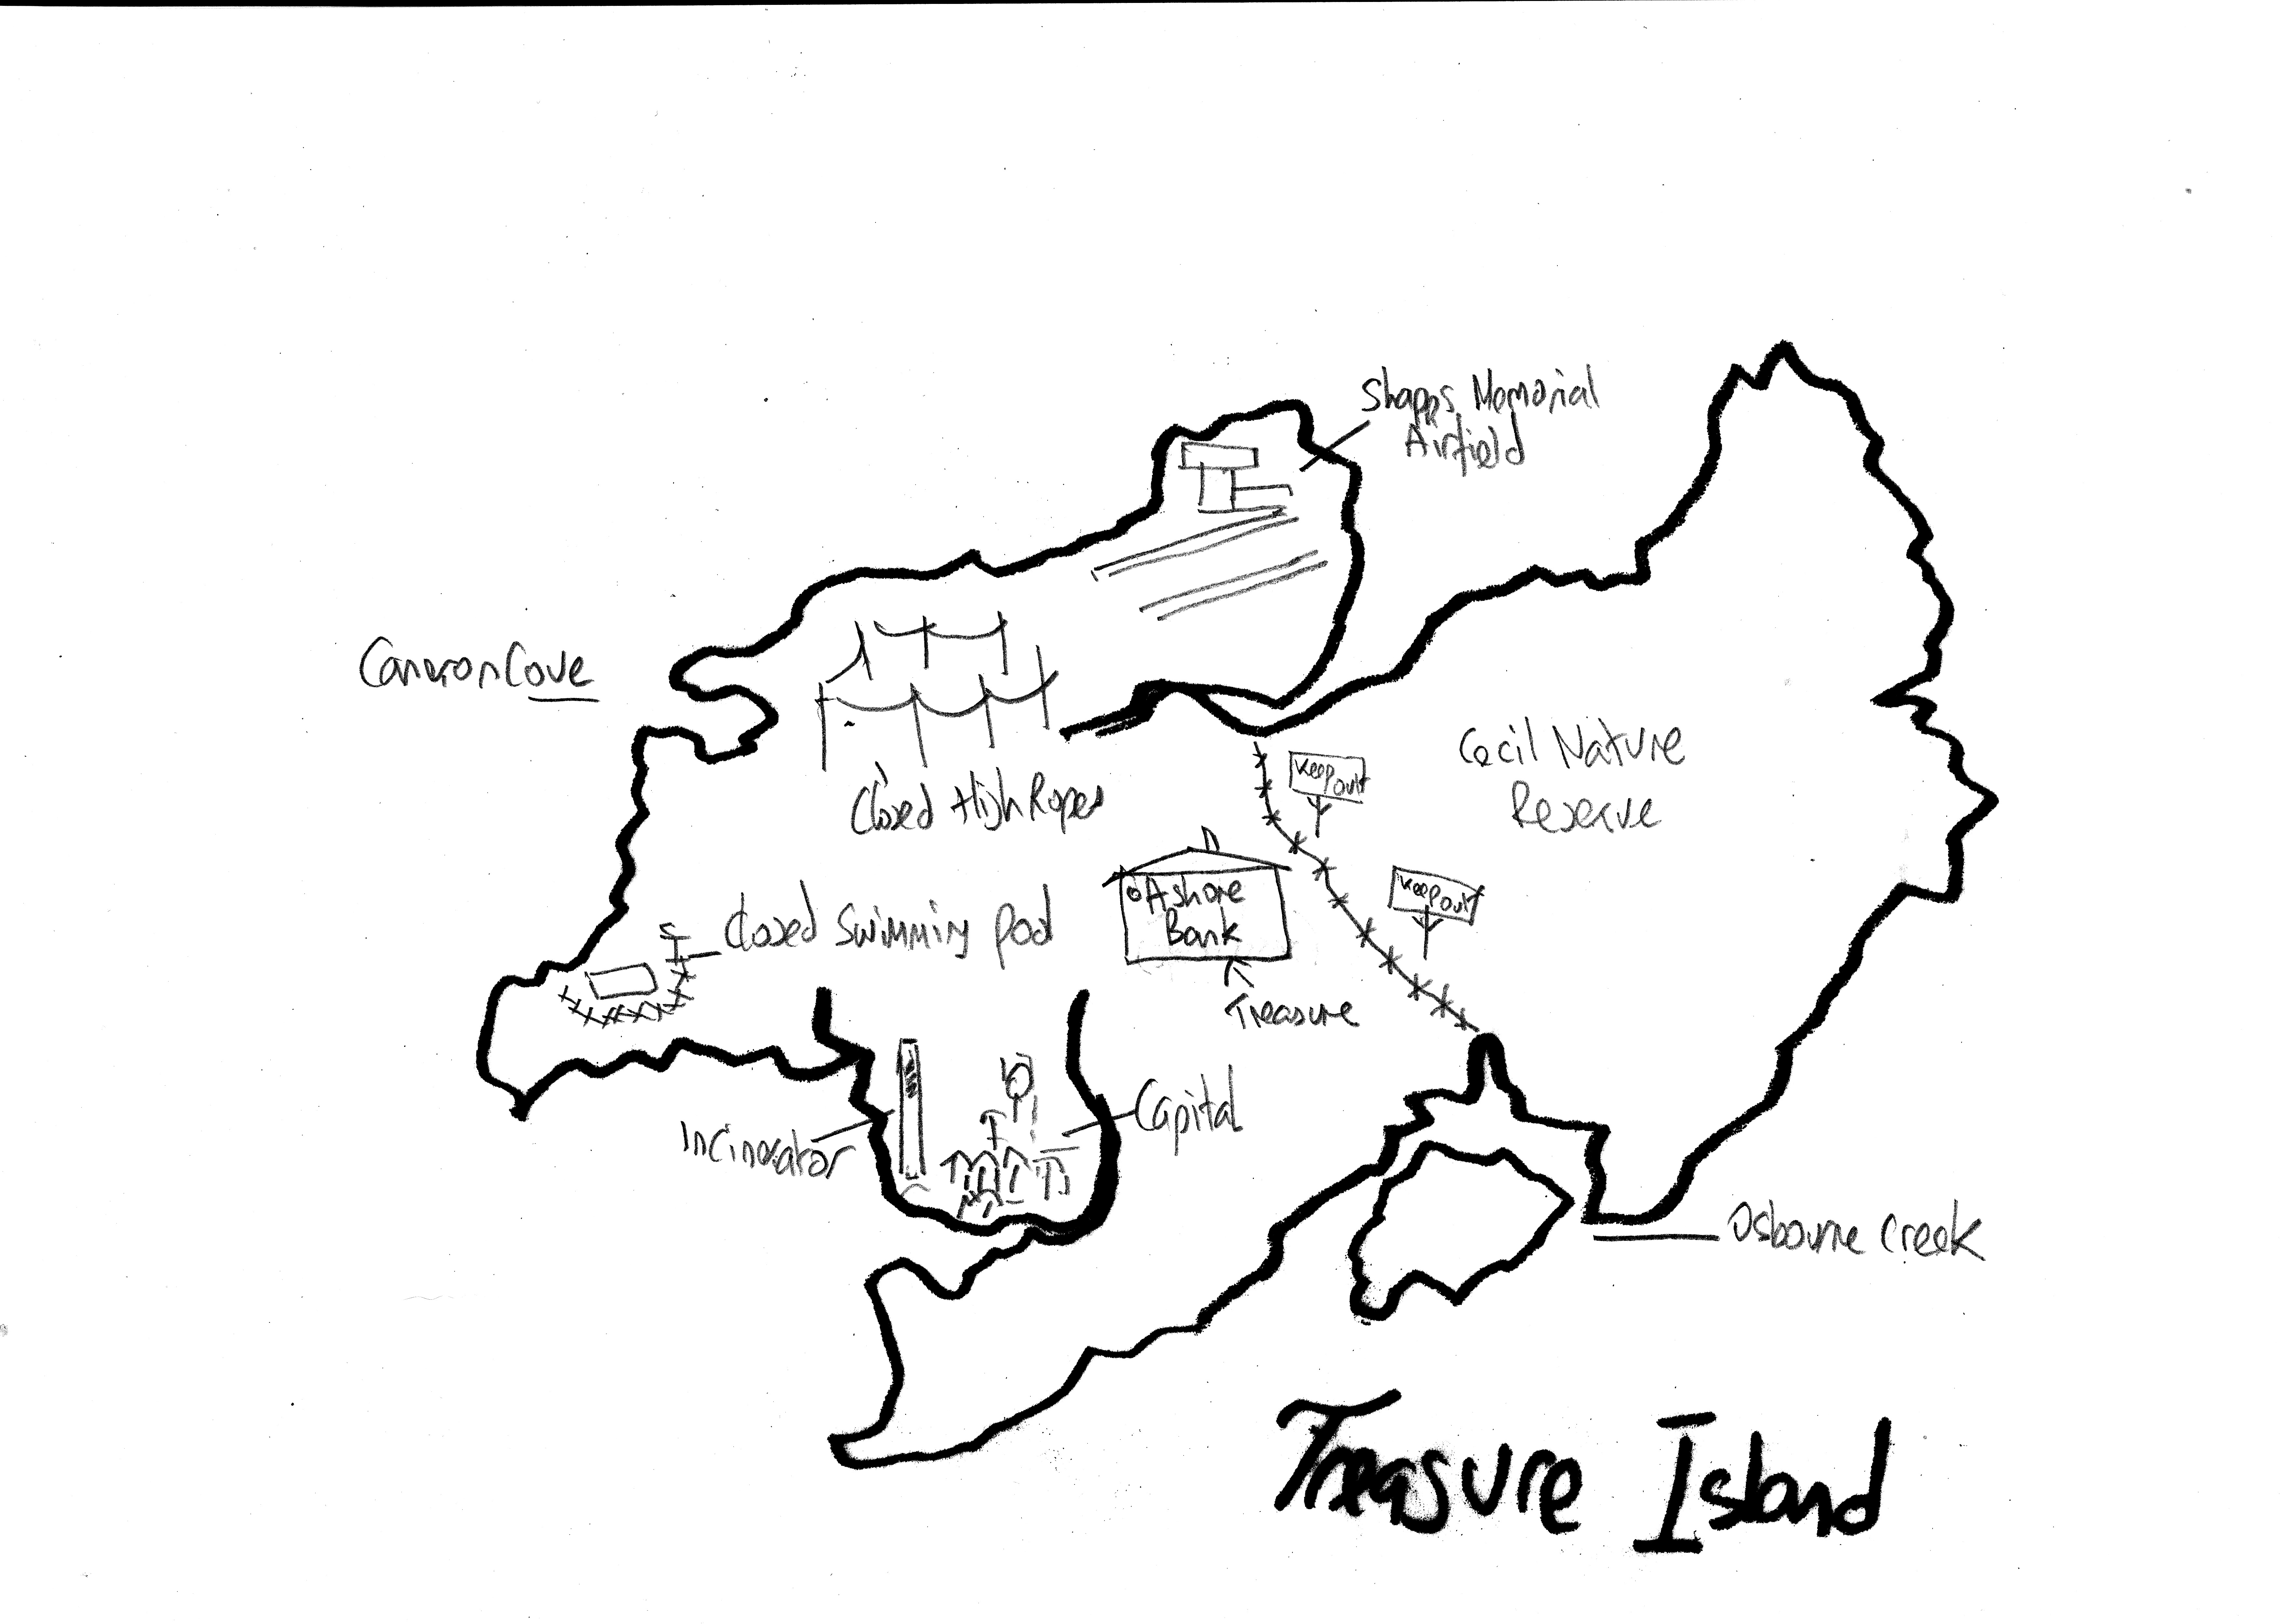 TreasureIsland)Detailed_160405.jpg